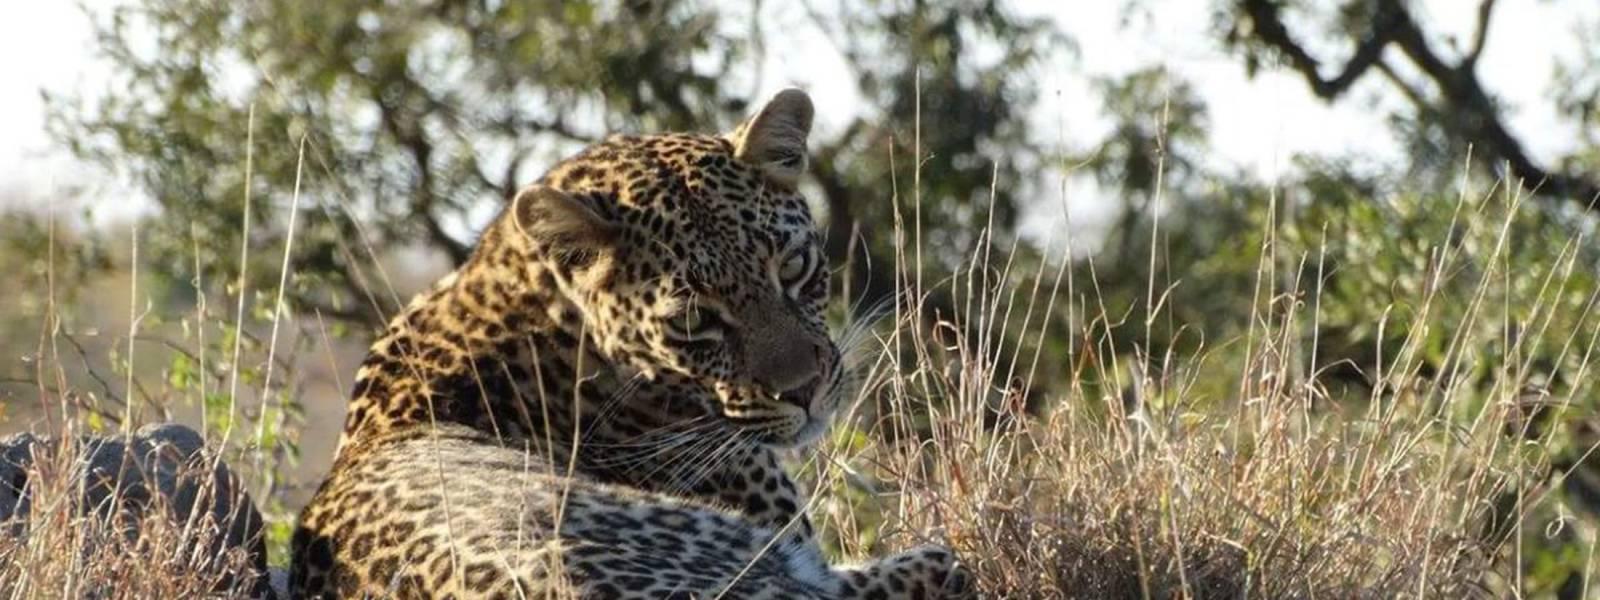 a leopard standing on a dry grass field